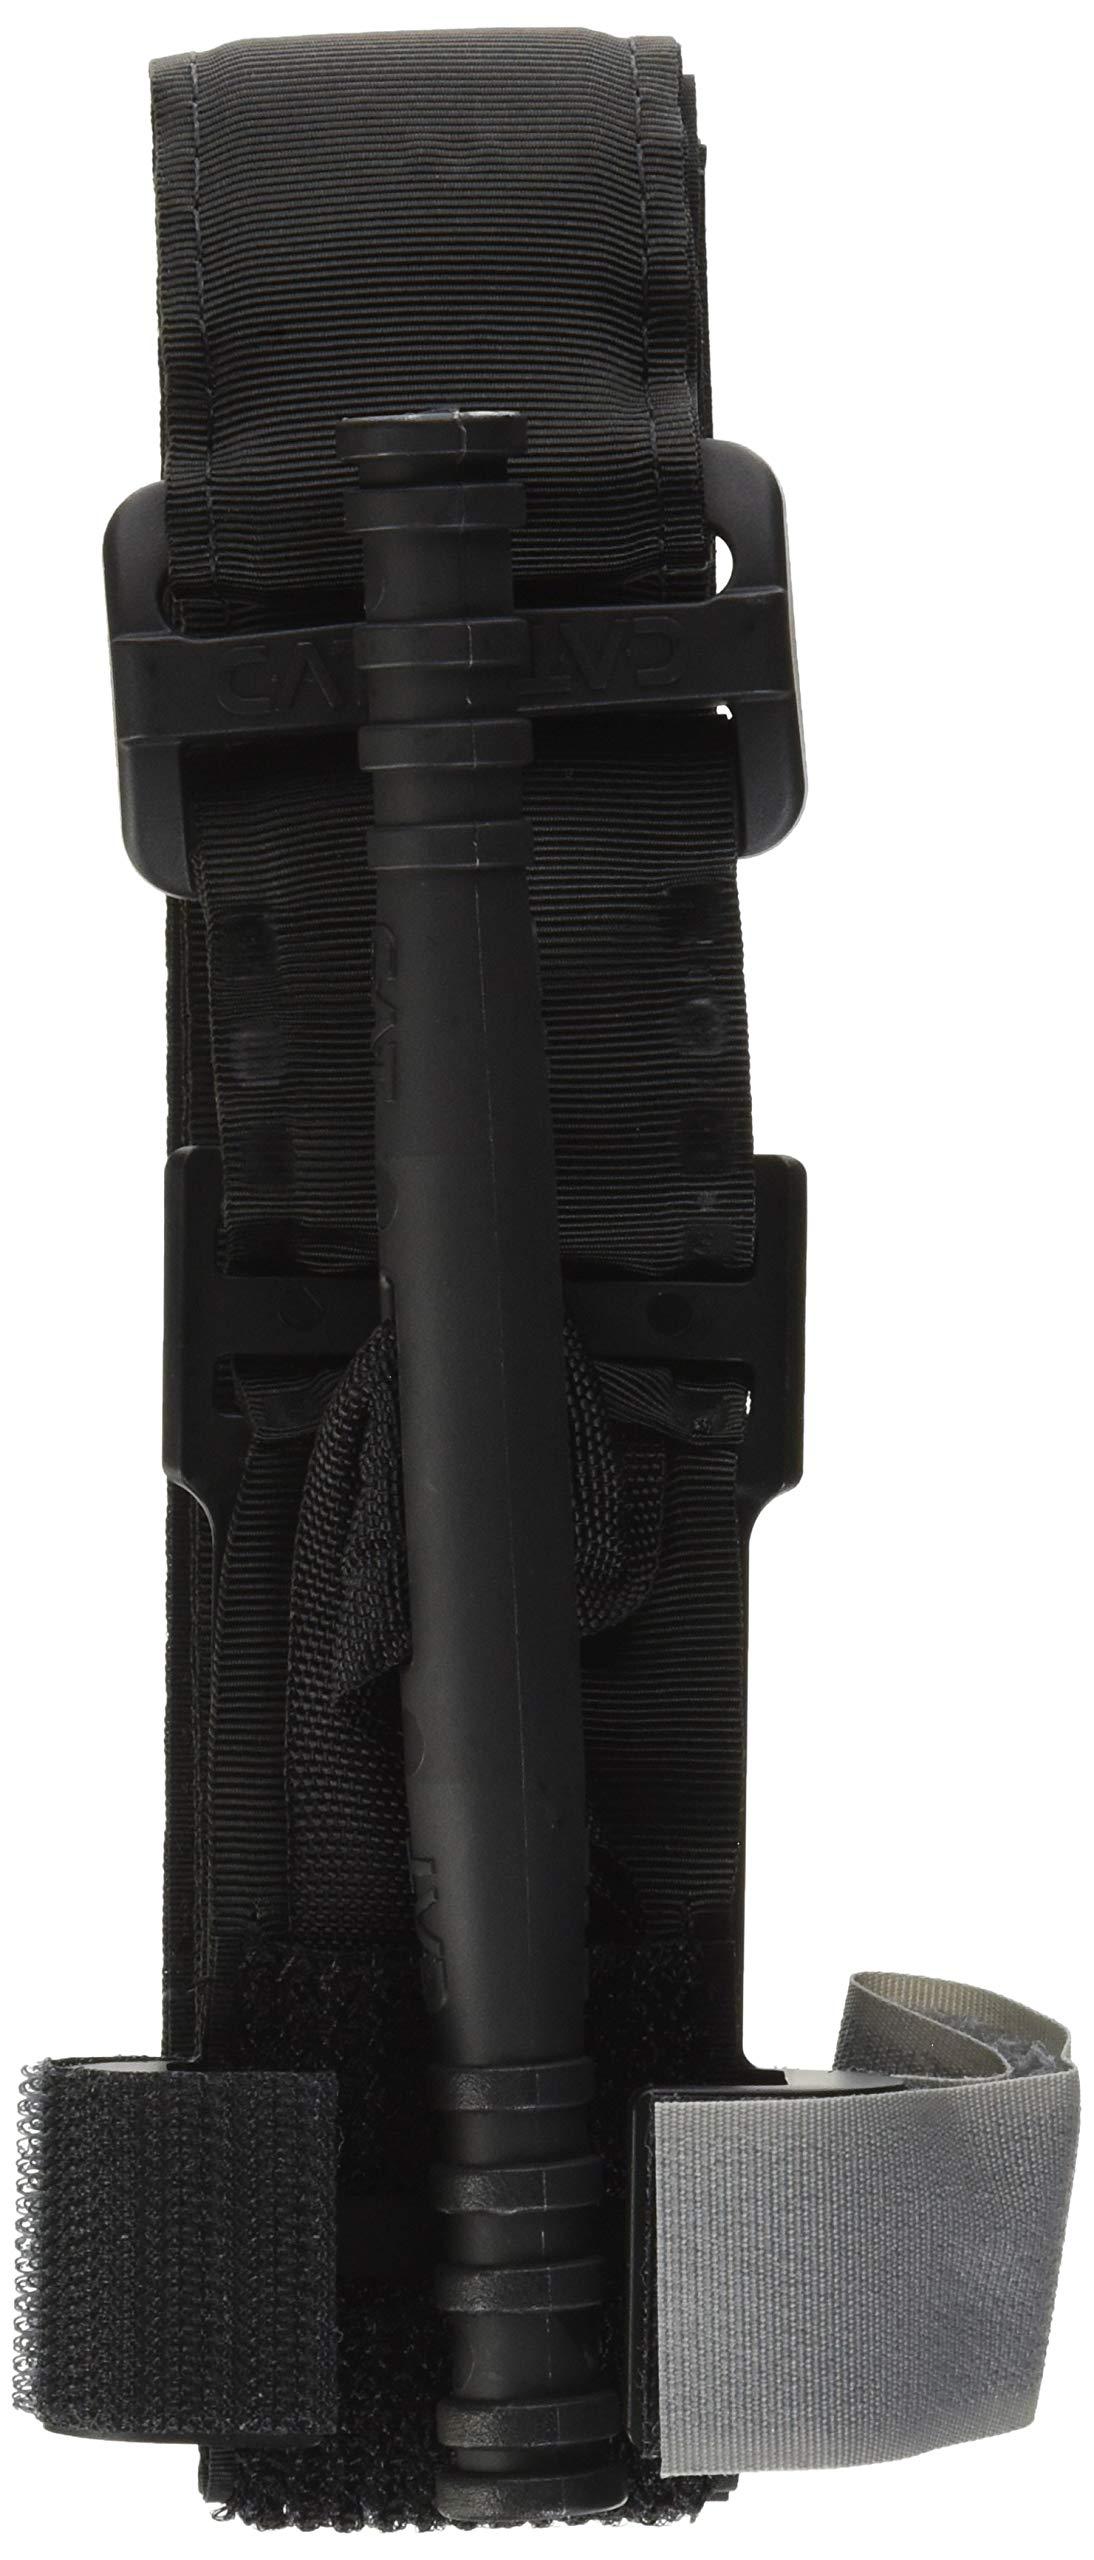 CAT Combat Application Tourniquet - GEN 7 (Gray Time-Stamp)